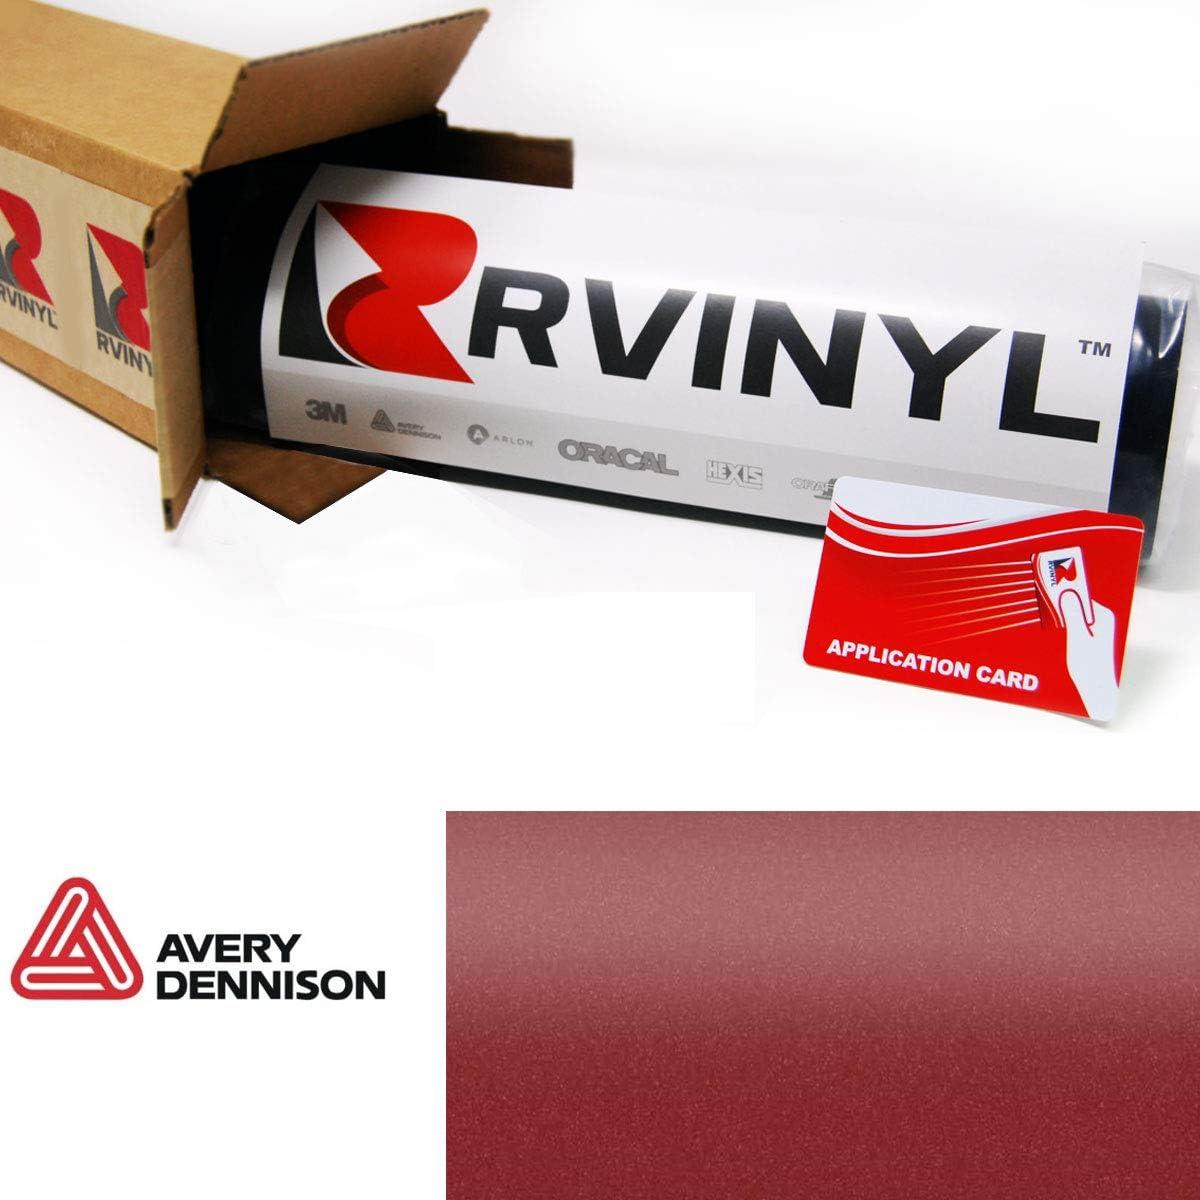 12 x 60 w//Application Card Avery SW900 444-M Matte Metallic Cherry Supreme Wrapping Film Vinyl Vehicle Car Wrap Sheet Roll